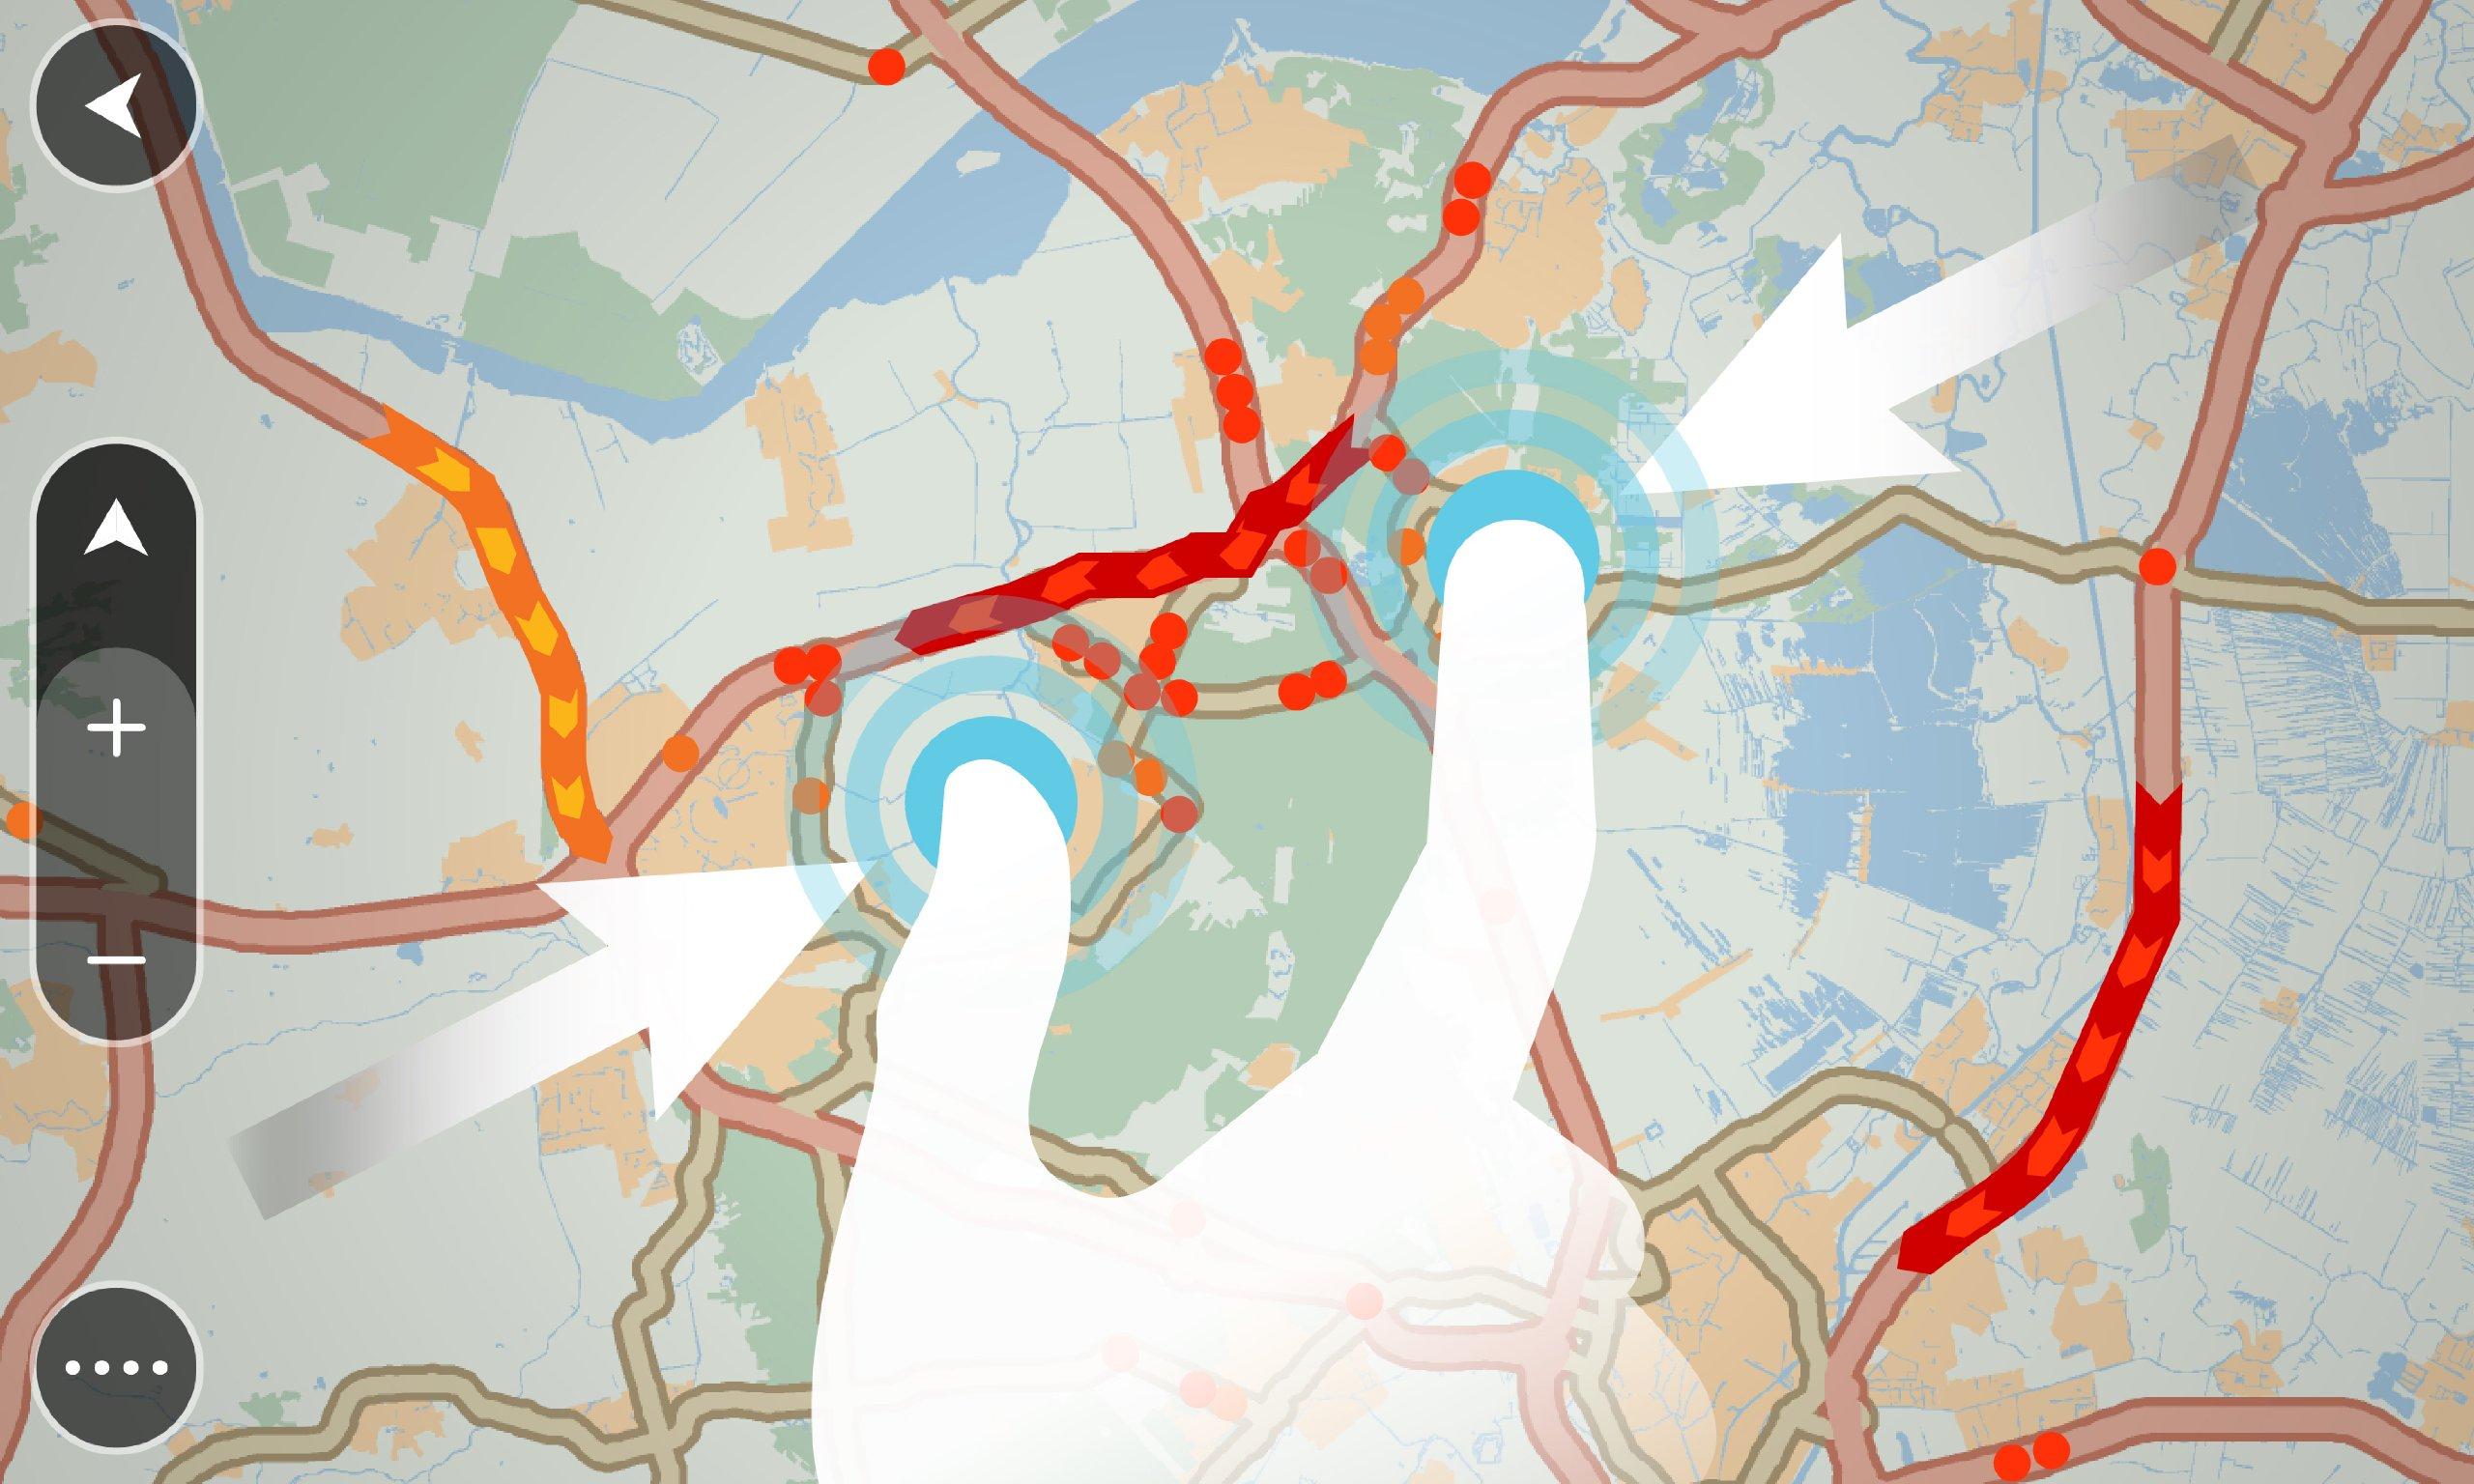 TomTom-GO-500-Europe-Traffic-Navigationssystem-kapazitives-Touch-Display-Bedienung-per-Fingergesten-Lifetime-TomTom-Traffic-Maps